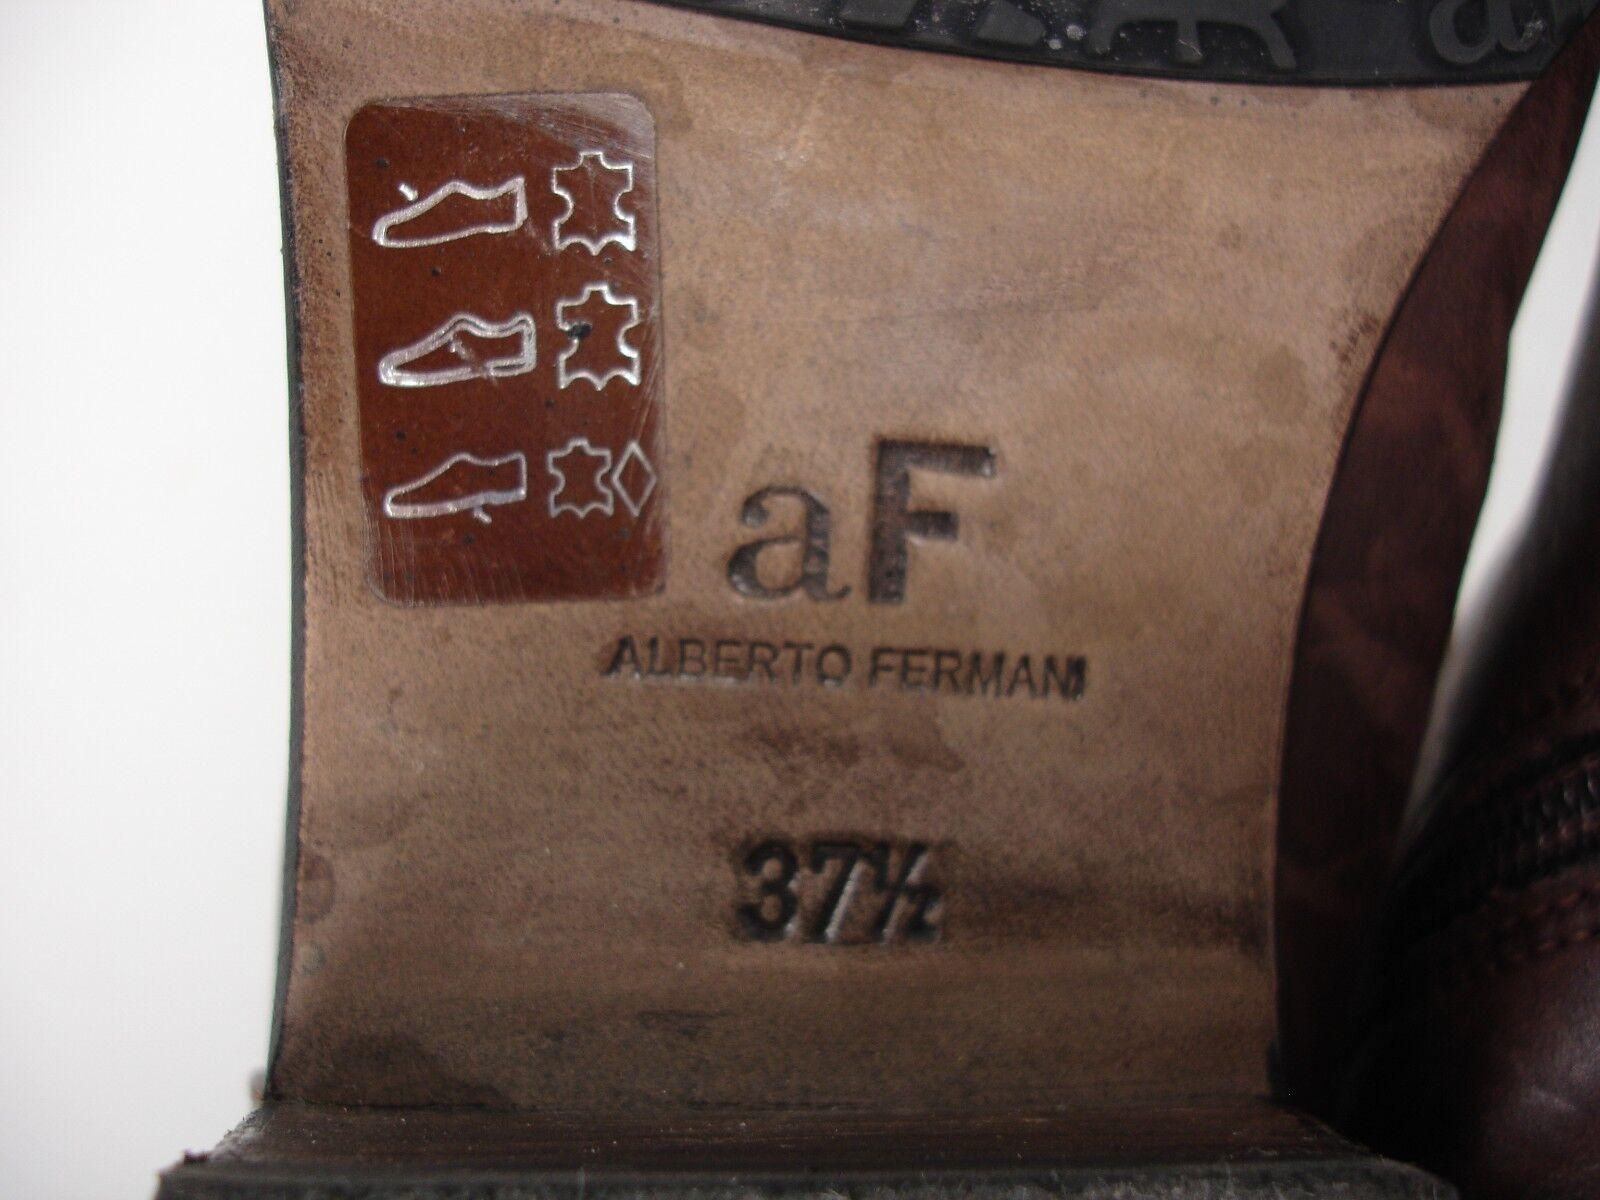 ALBERTO ALBERTO ALBERTO FERMANI marron LEATHER 3 4 SIDE ZIP OVER THE KNEE bottes femmes 37.5 971969